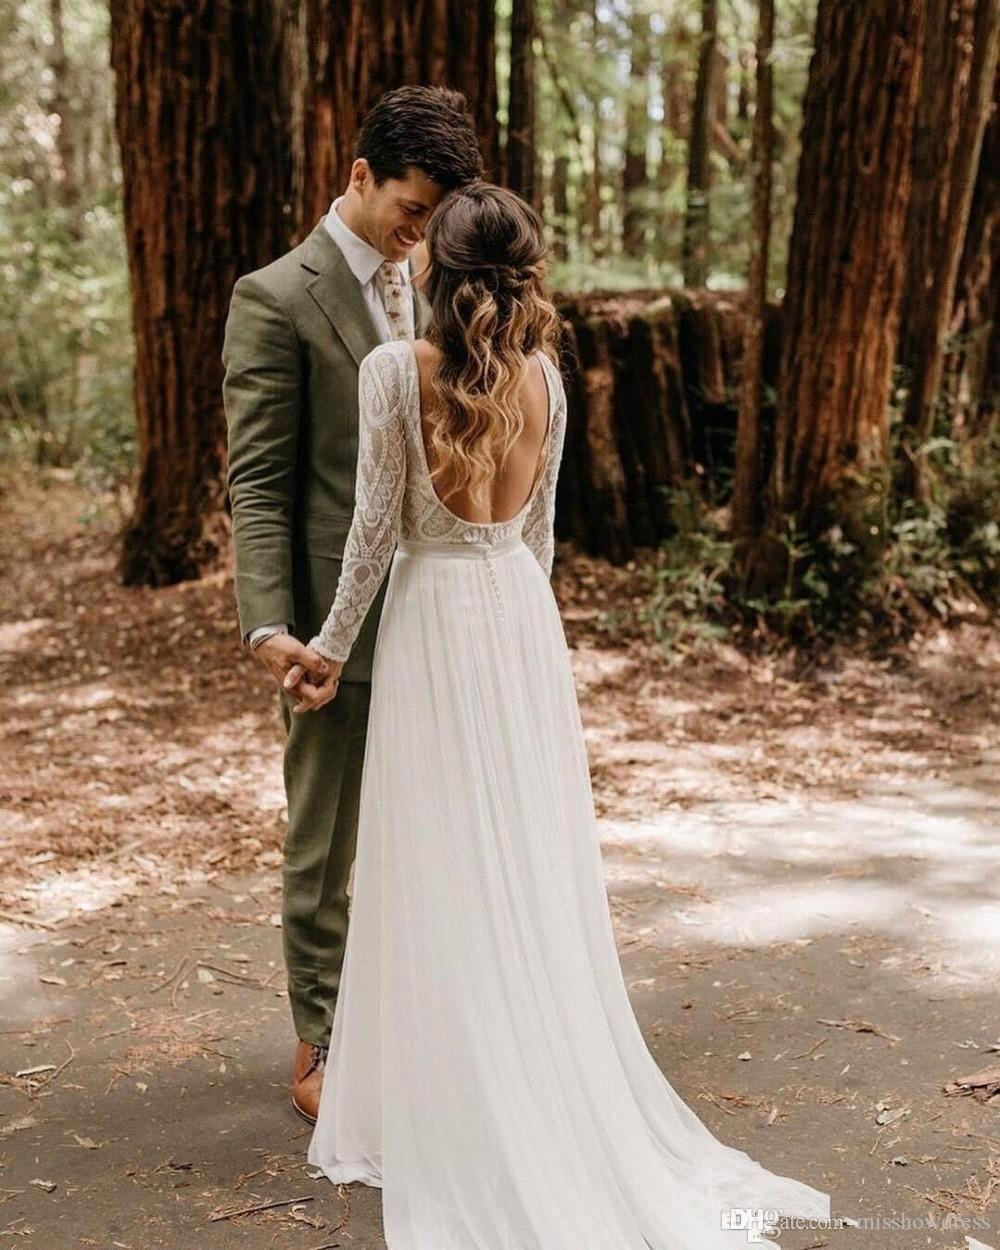 https://www.dhresource.com/0x0s/f2-albu-g8-M01-95-FD-rBVaV10LXieAClaQAAR05p-d8pc955.jpg/beach-bohemian-wedding-dresses-sexy-backless.jpg